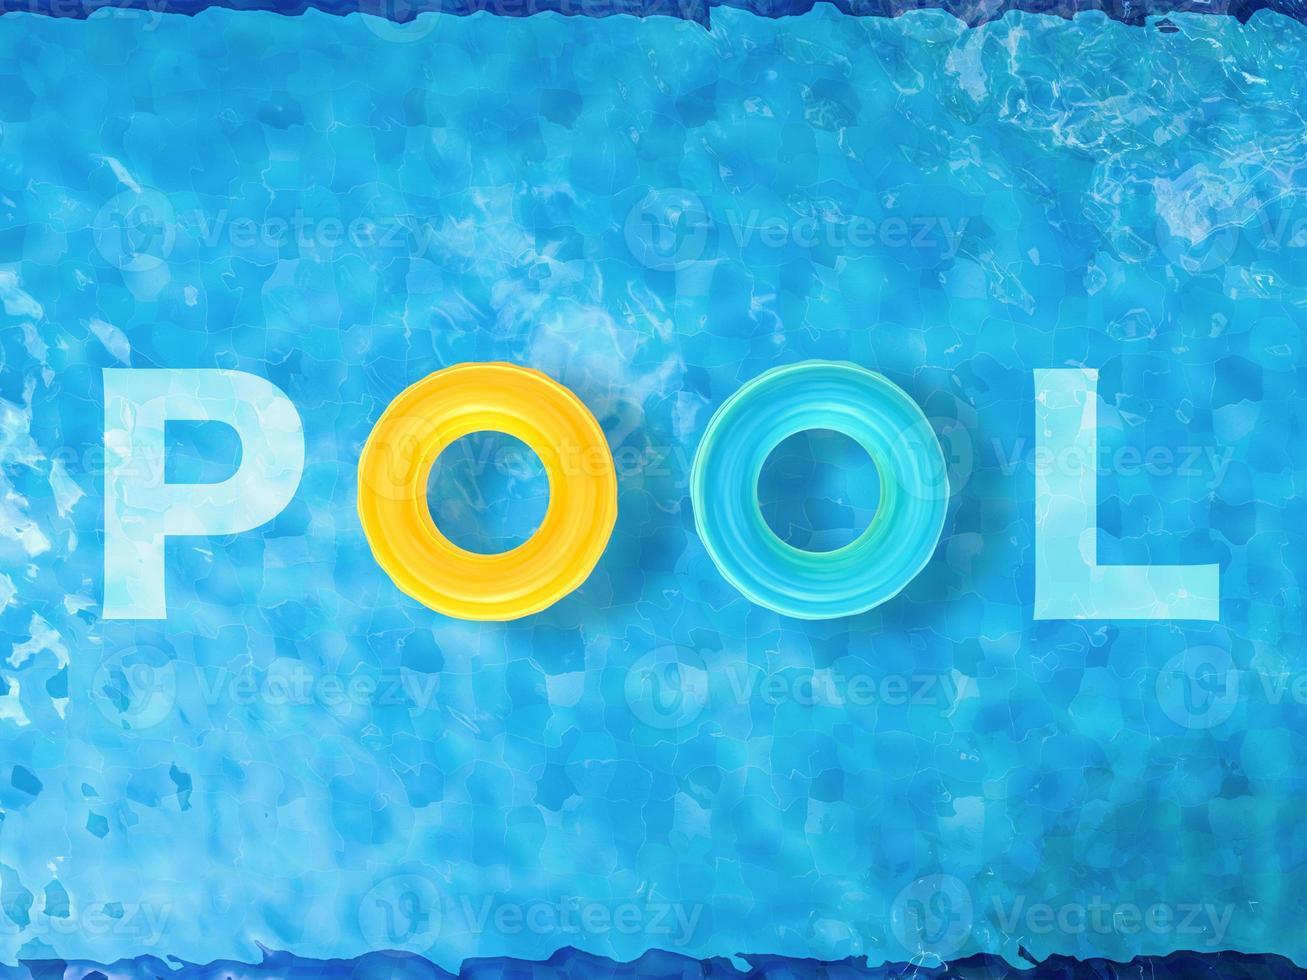 Pool Draufsicht foto